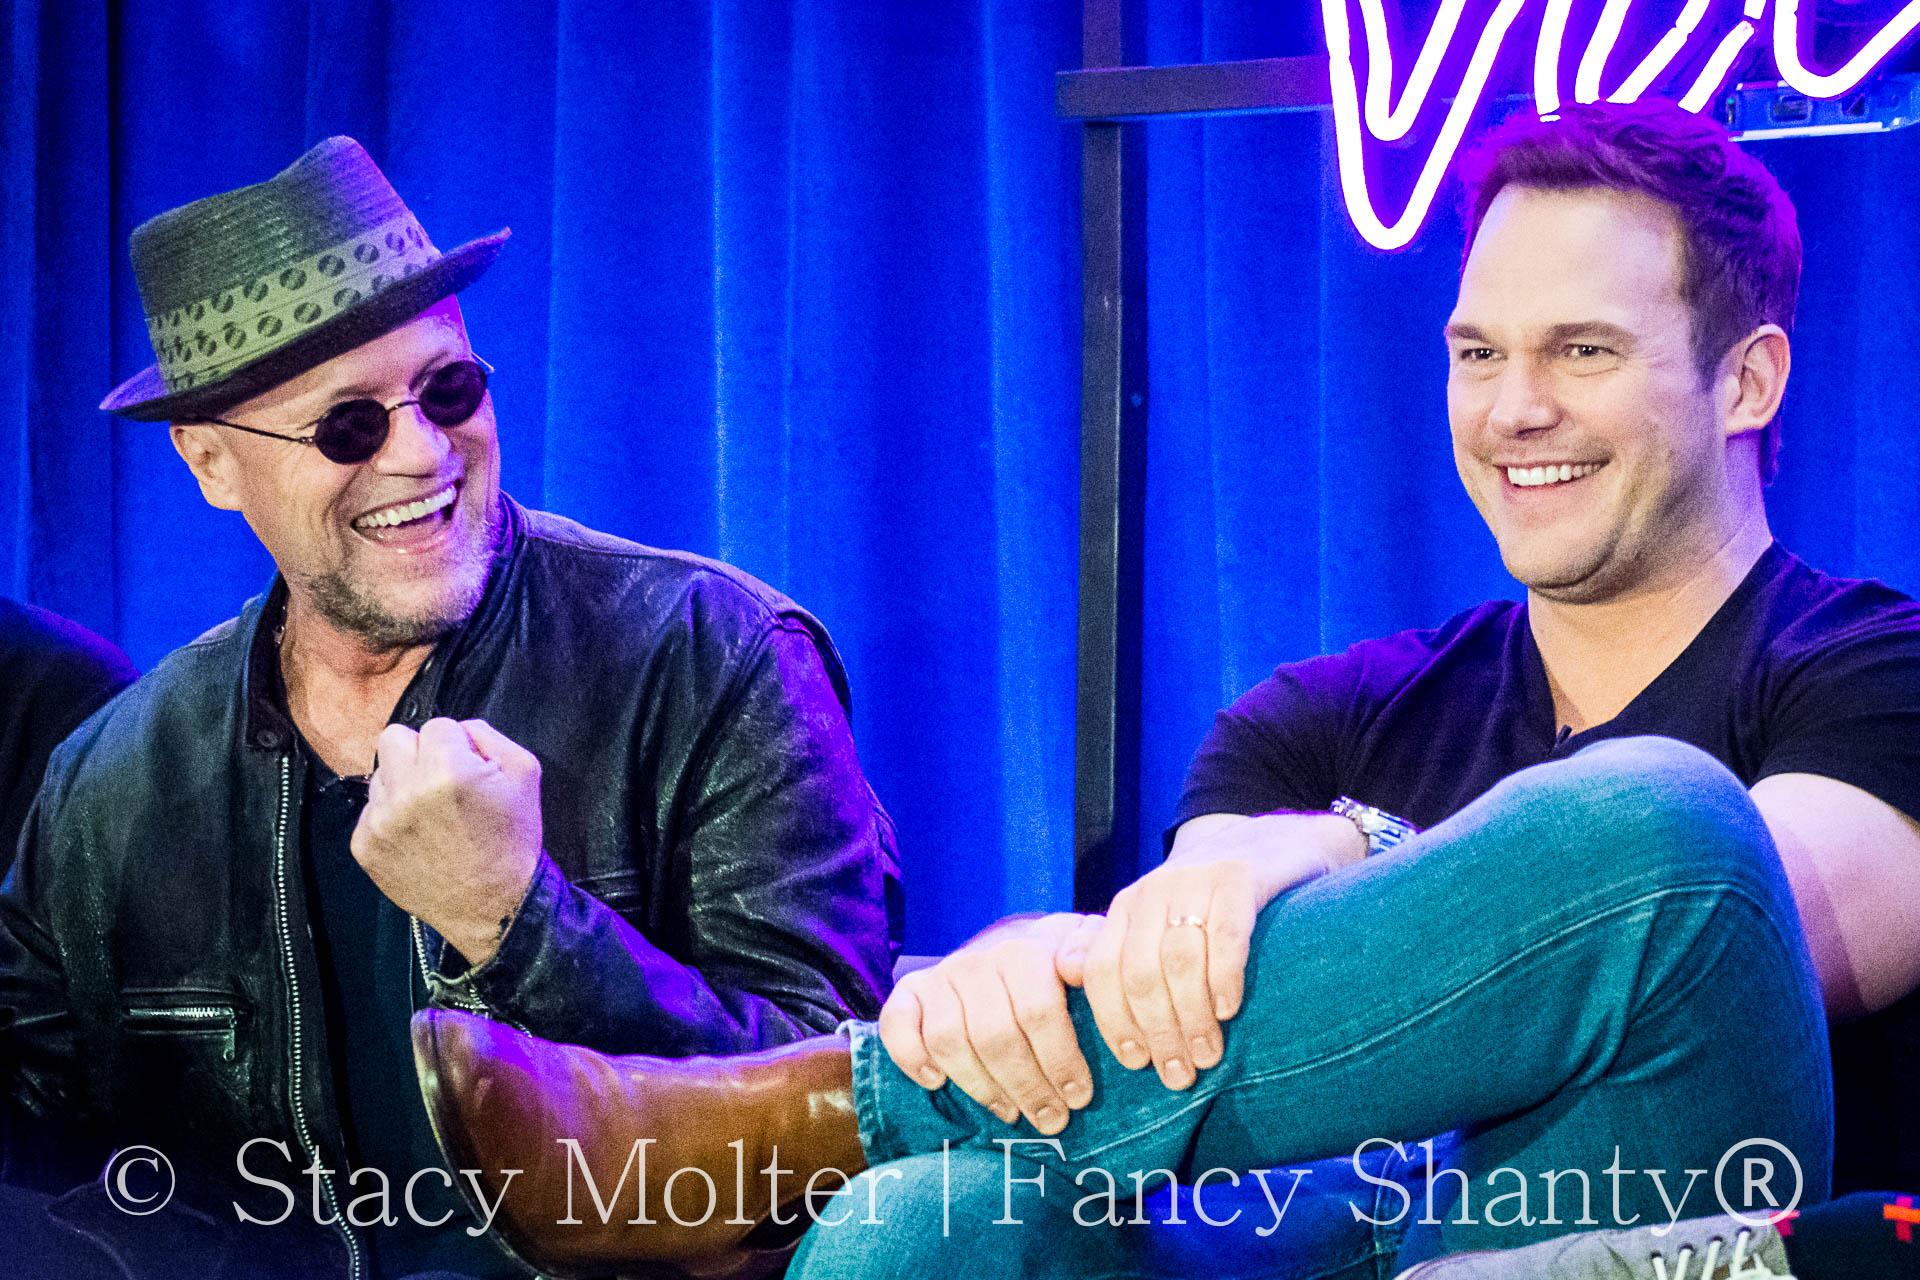 Chris Pratt, Michael Rooker- MARVEL's Guardians of the Galaxy 2 Press Conference